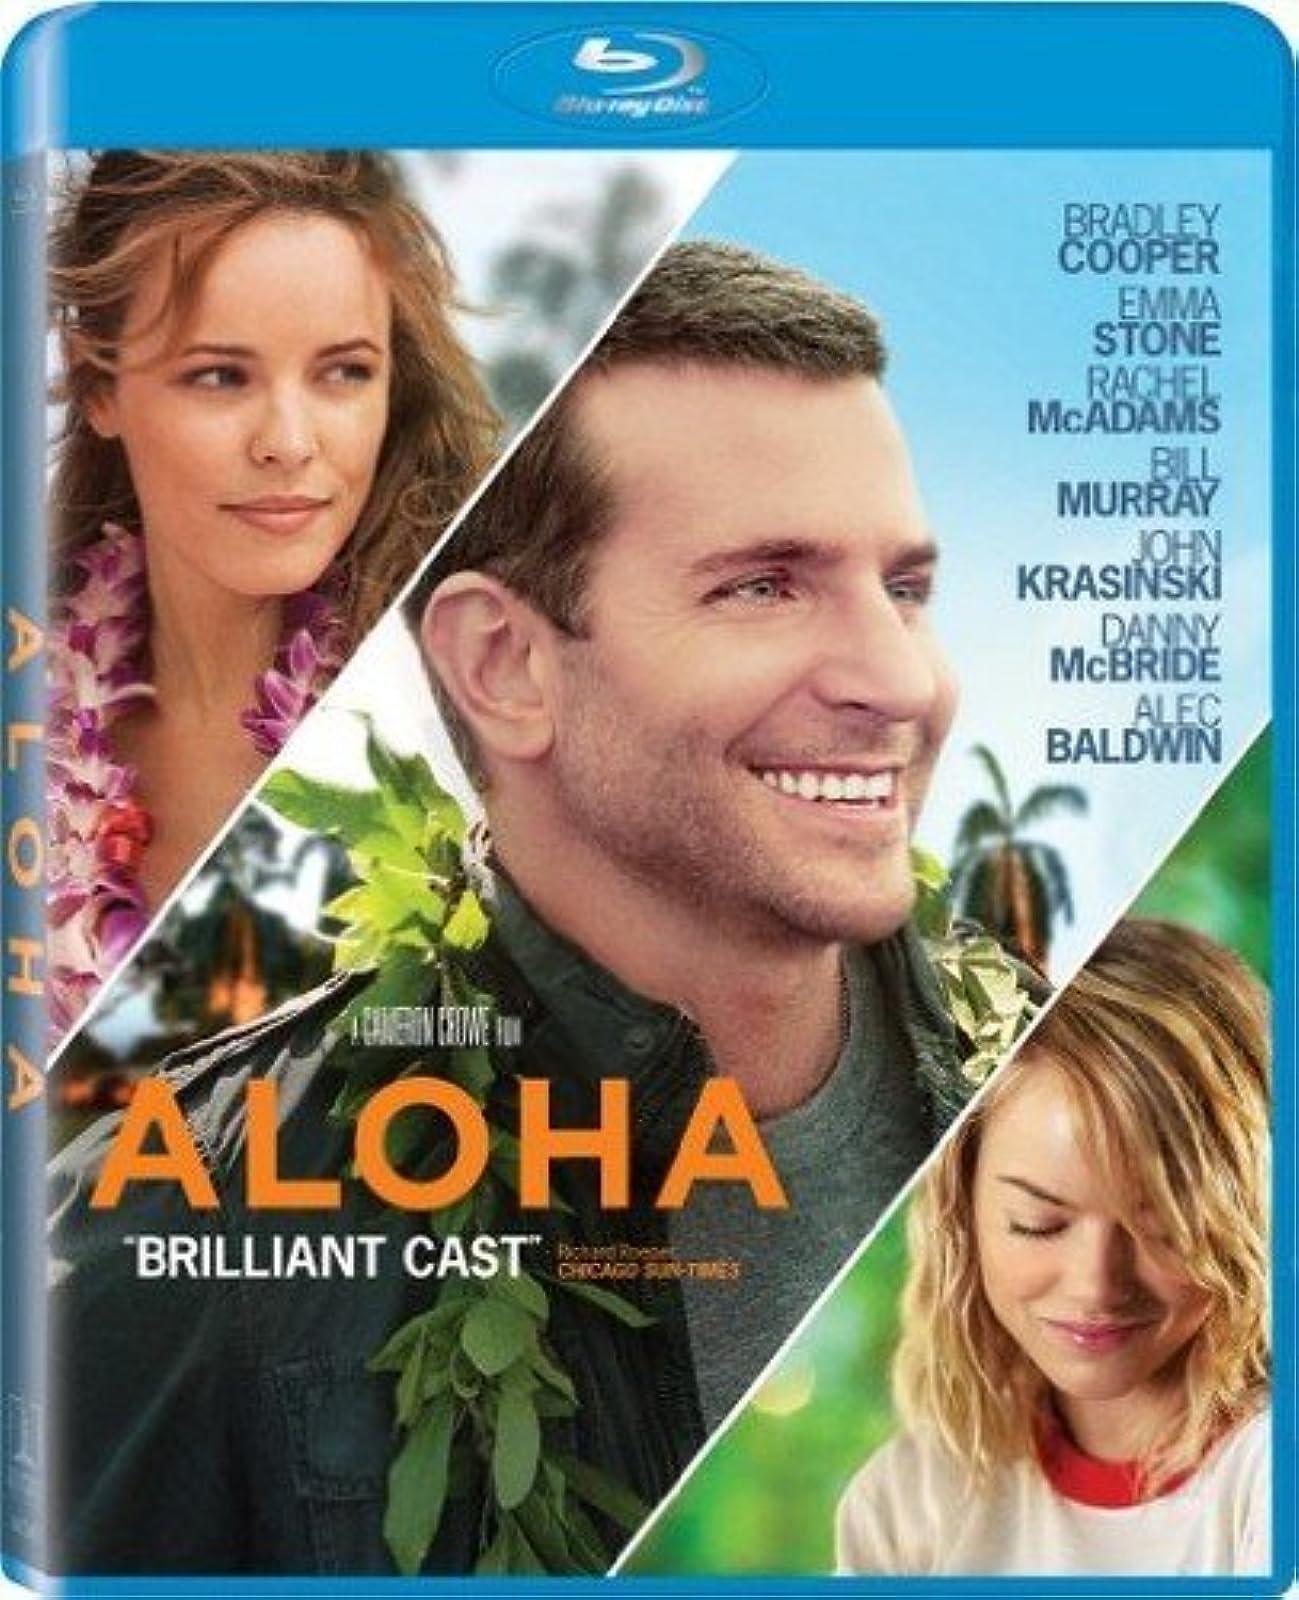 Aloha Blu-Ray On Blu-Ray With Bradley Cooper Comedy